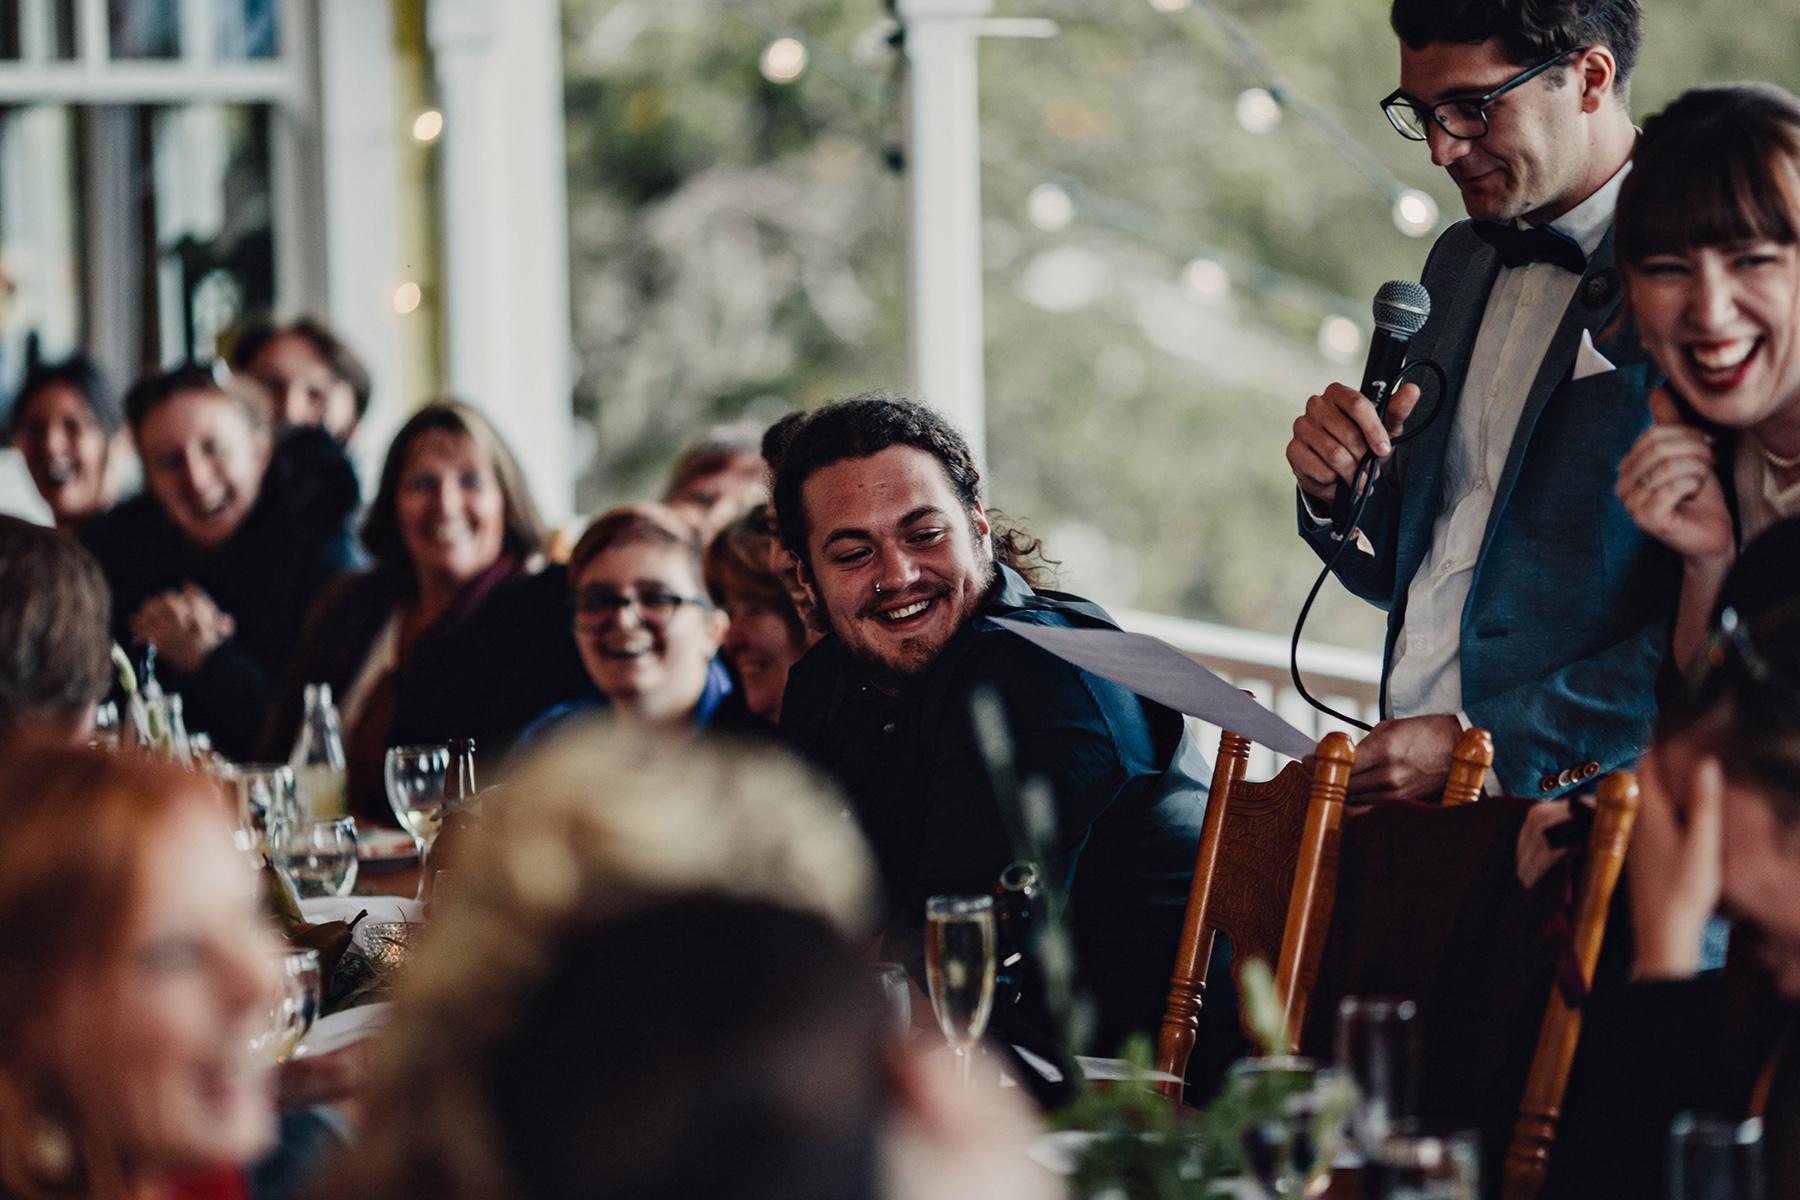 chelsea-brian-wedding-photos-0015.jpg